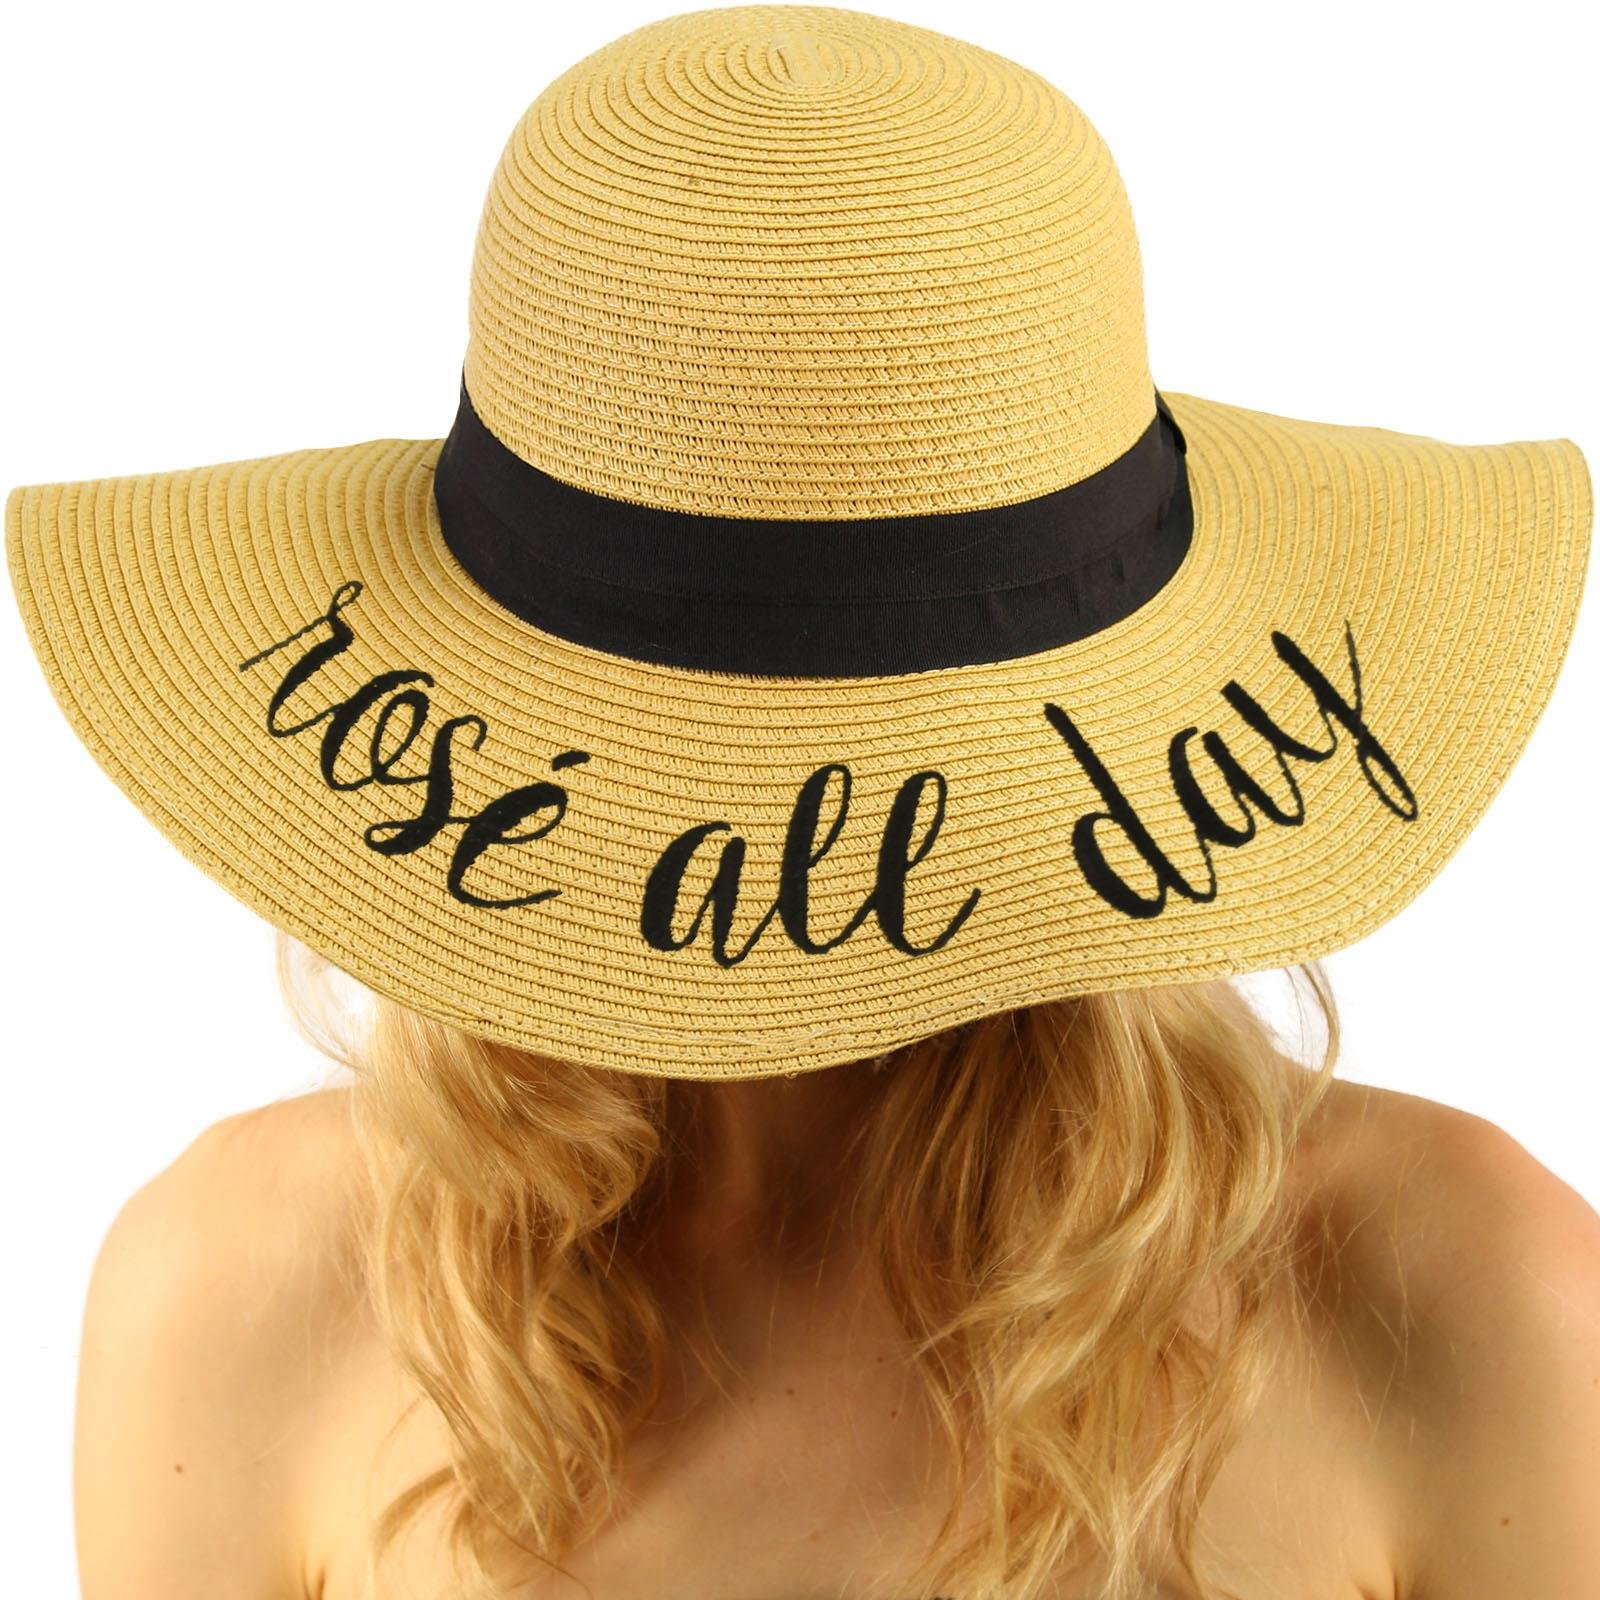 C.C Fun Verbiage Elegant Wide Brim 4 Summer Derby Beach Pool Floppy Dress Sun Hat Natural (Rose All Day)